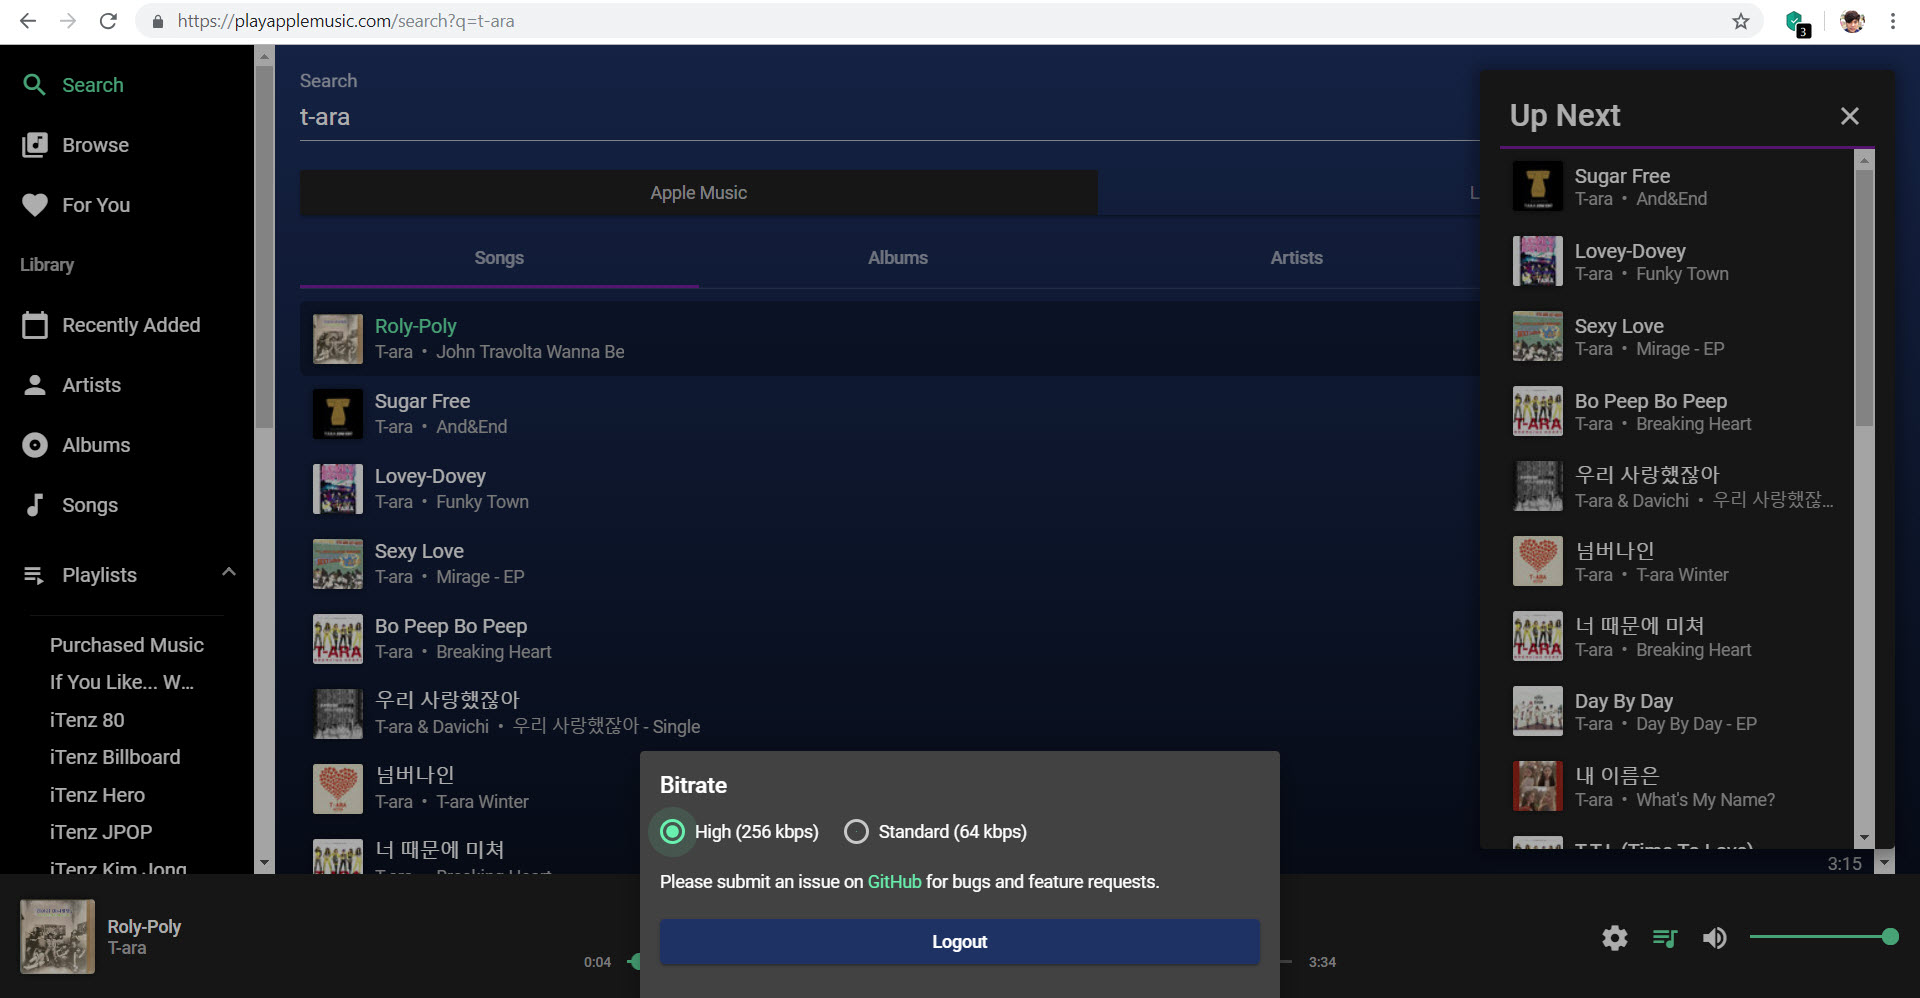 Playapplemusic Web Player Img 7